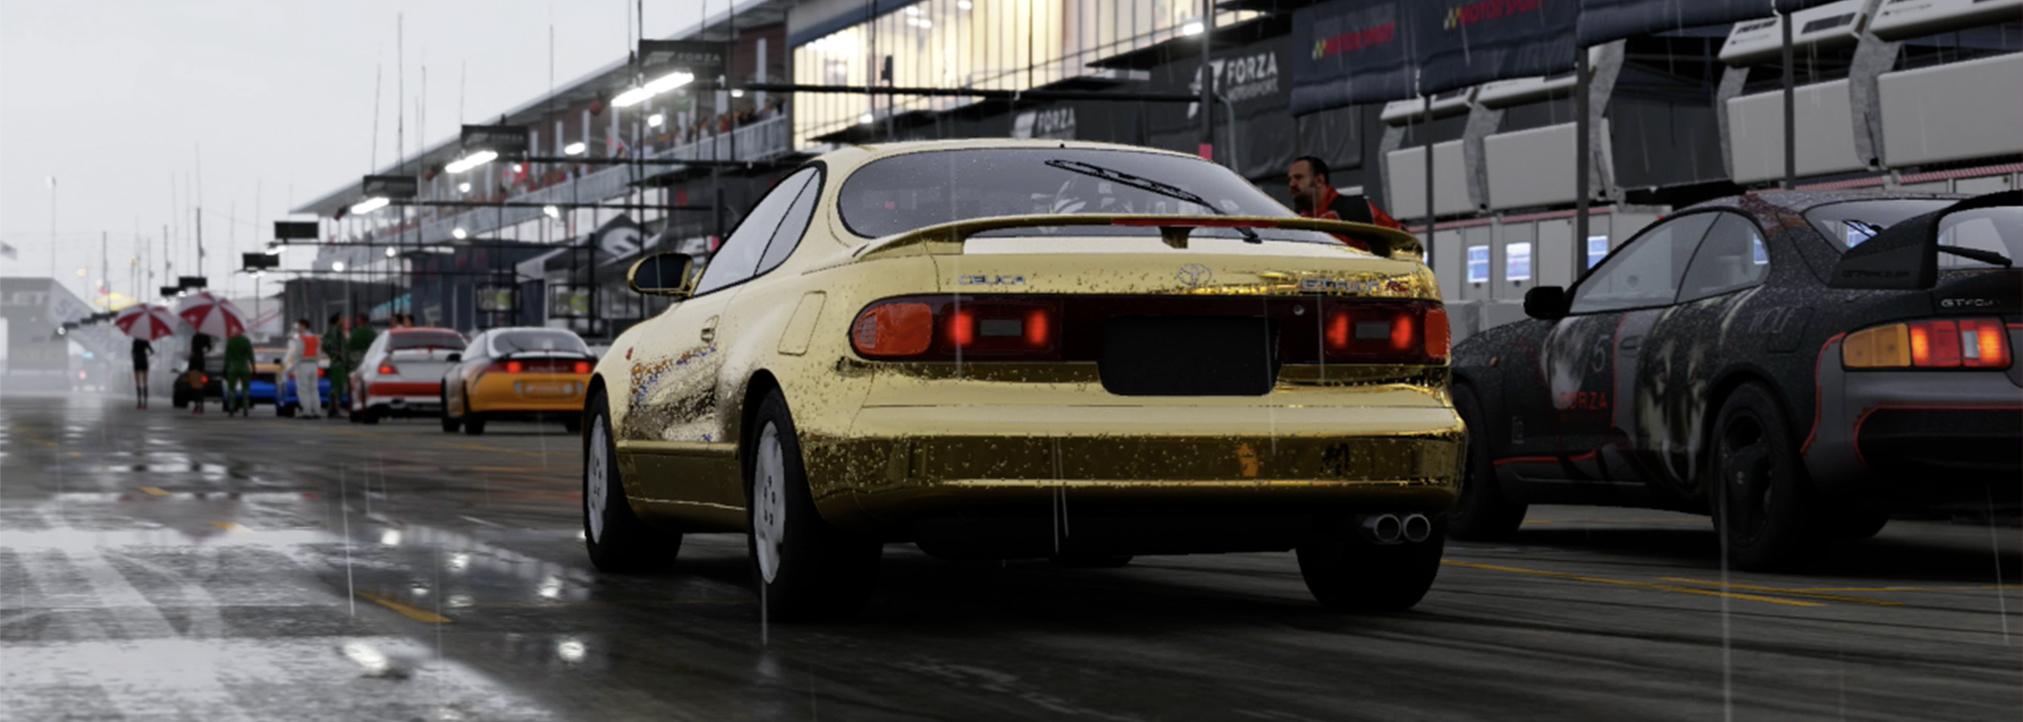 Forza Motorsport 6 rain wet pavement start of race. Gold plated car.